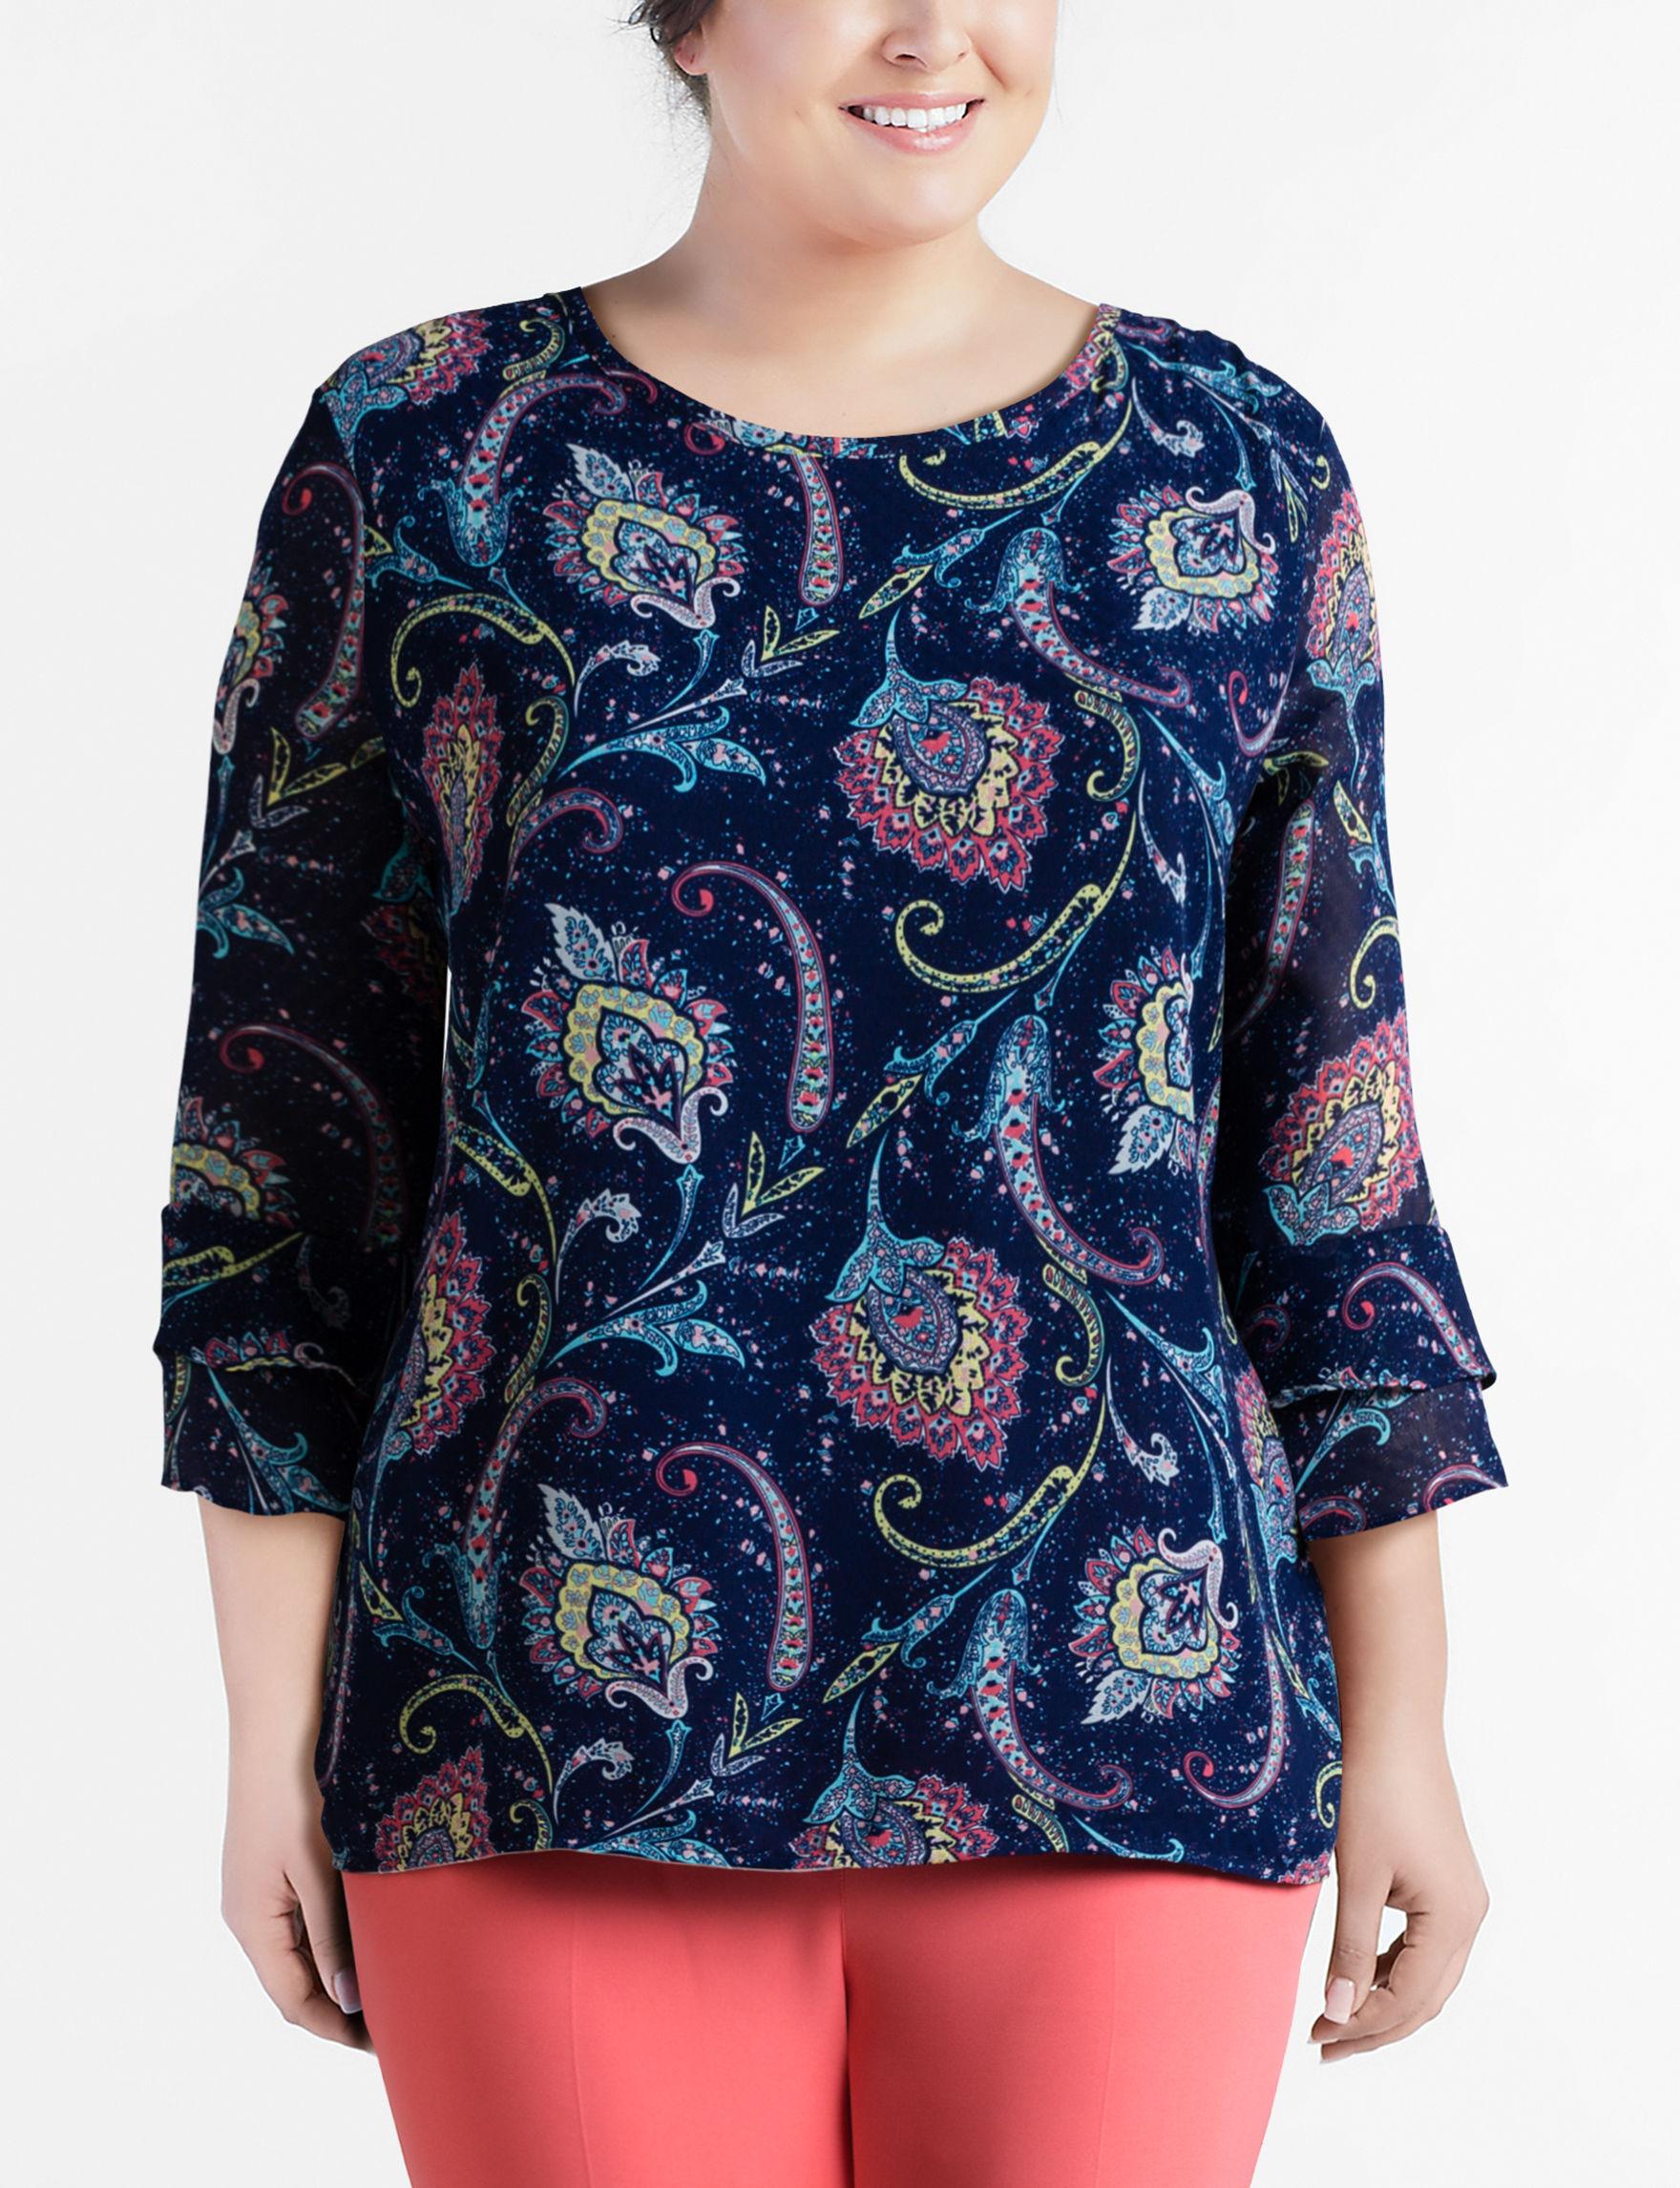 Valerie Stevens Blue Paisley Shirts & Blouses